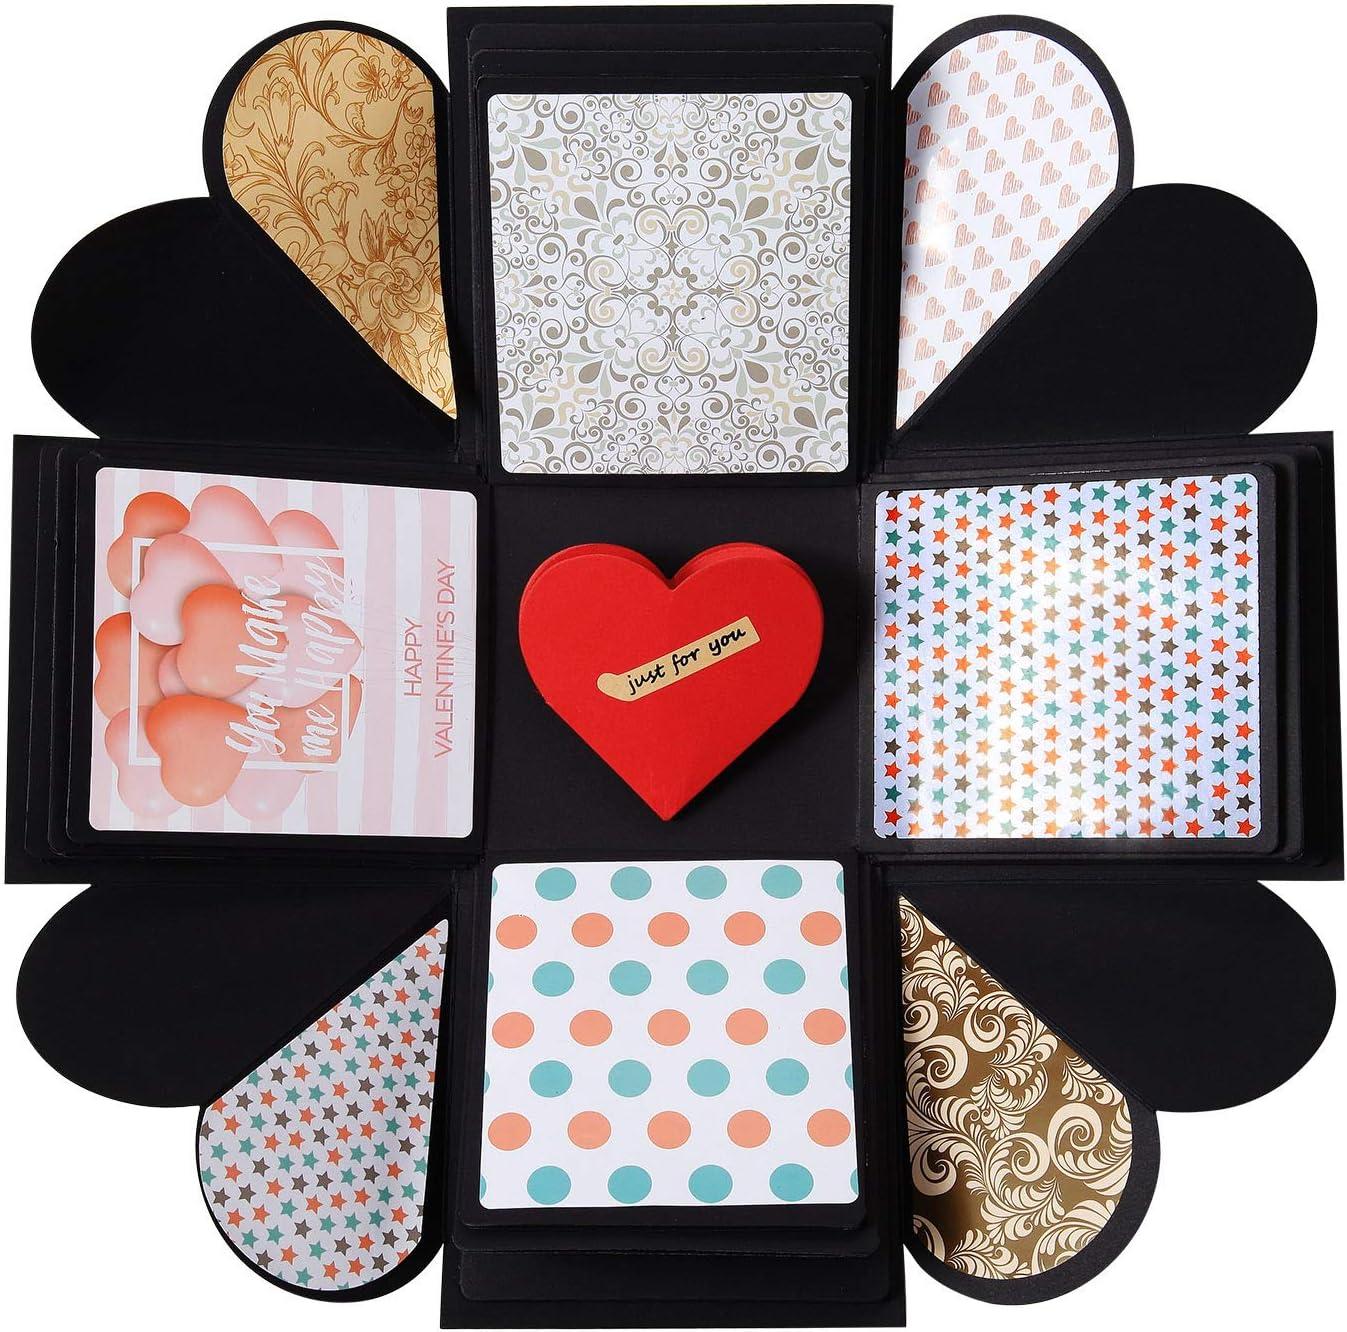 DIY Gift Box   Memory DIY Photo Album   Surprise Box   Creative Scrapbook Album for Engagement Wedding Birthday Valentine's Day Anniversary Gifts